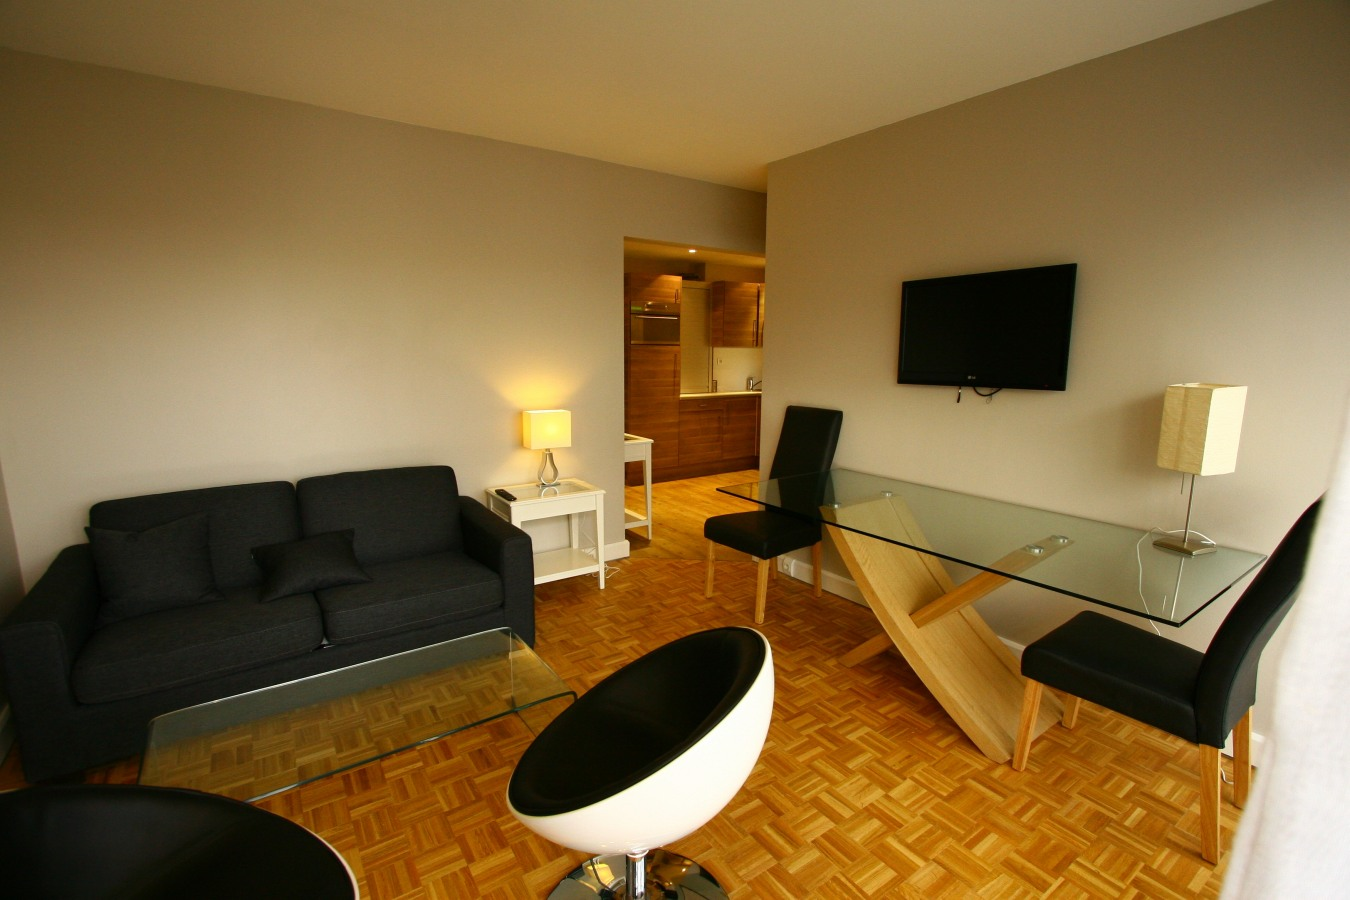 Hotel Convention Montparnasse - Apartamentos